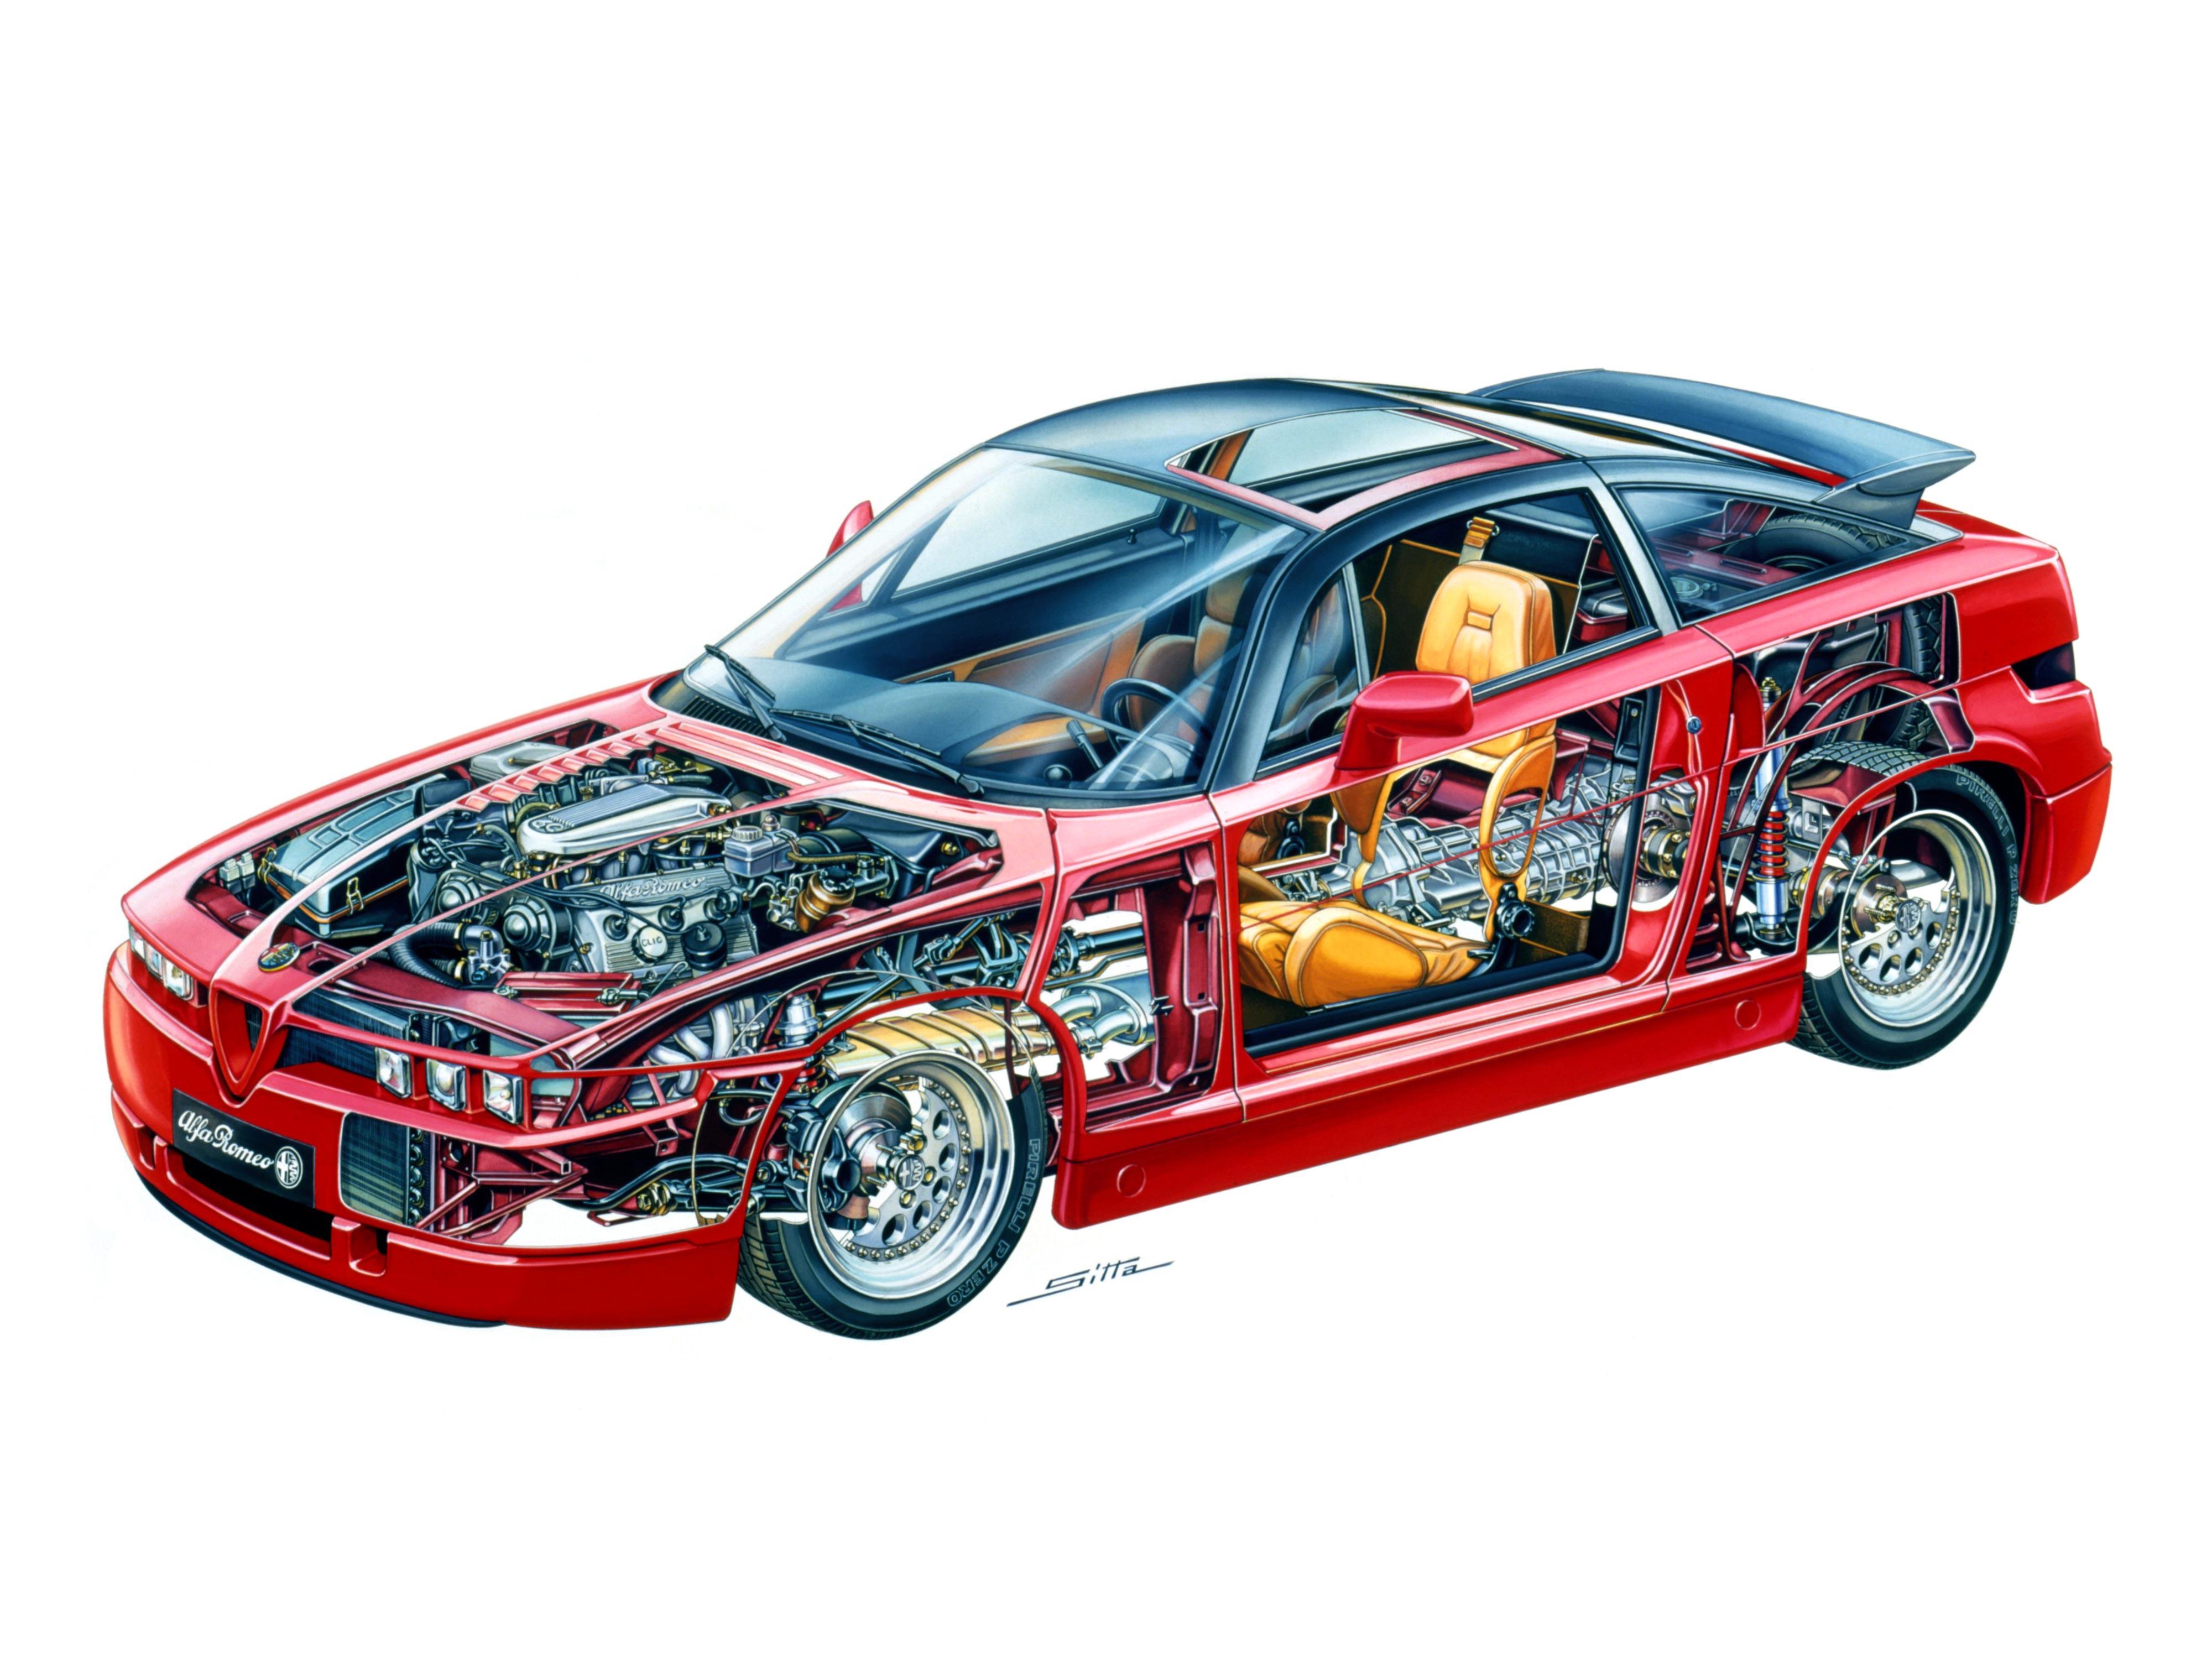 Alfa Romeo SZ cutaway drawing